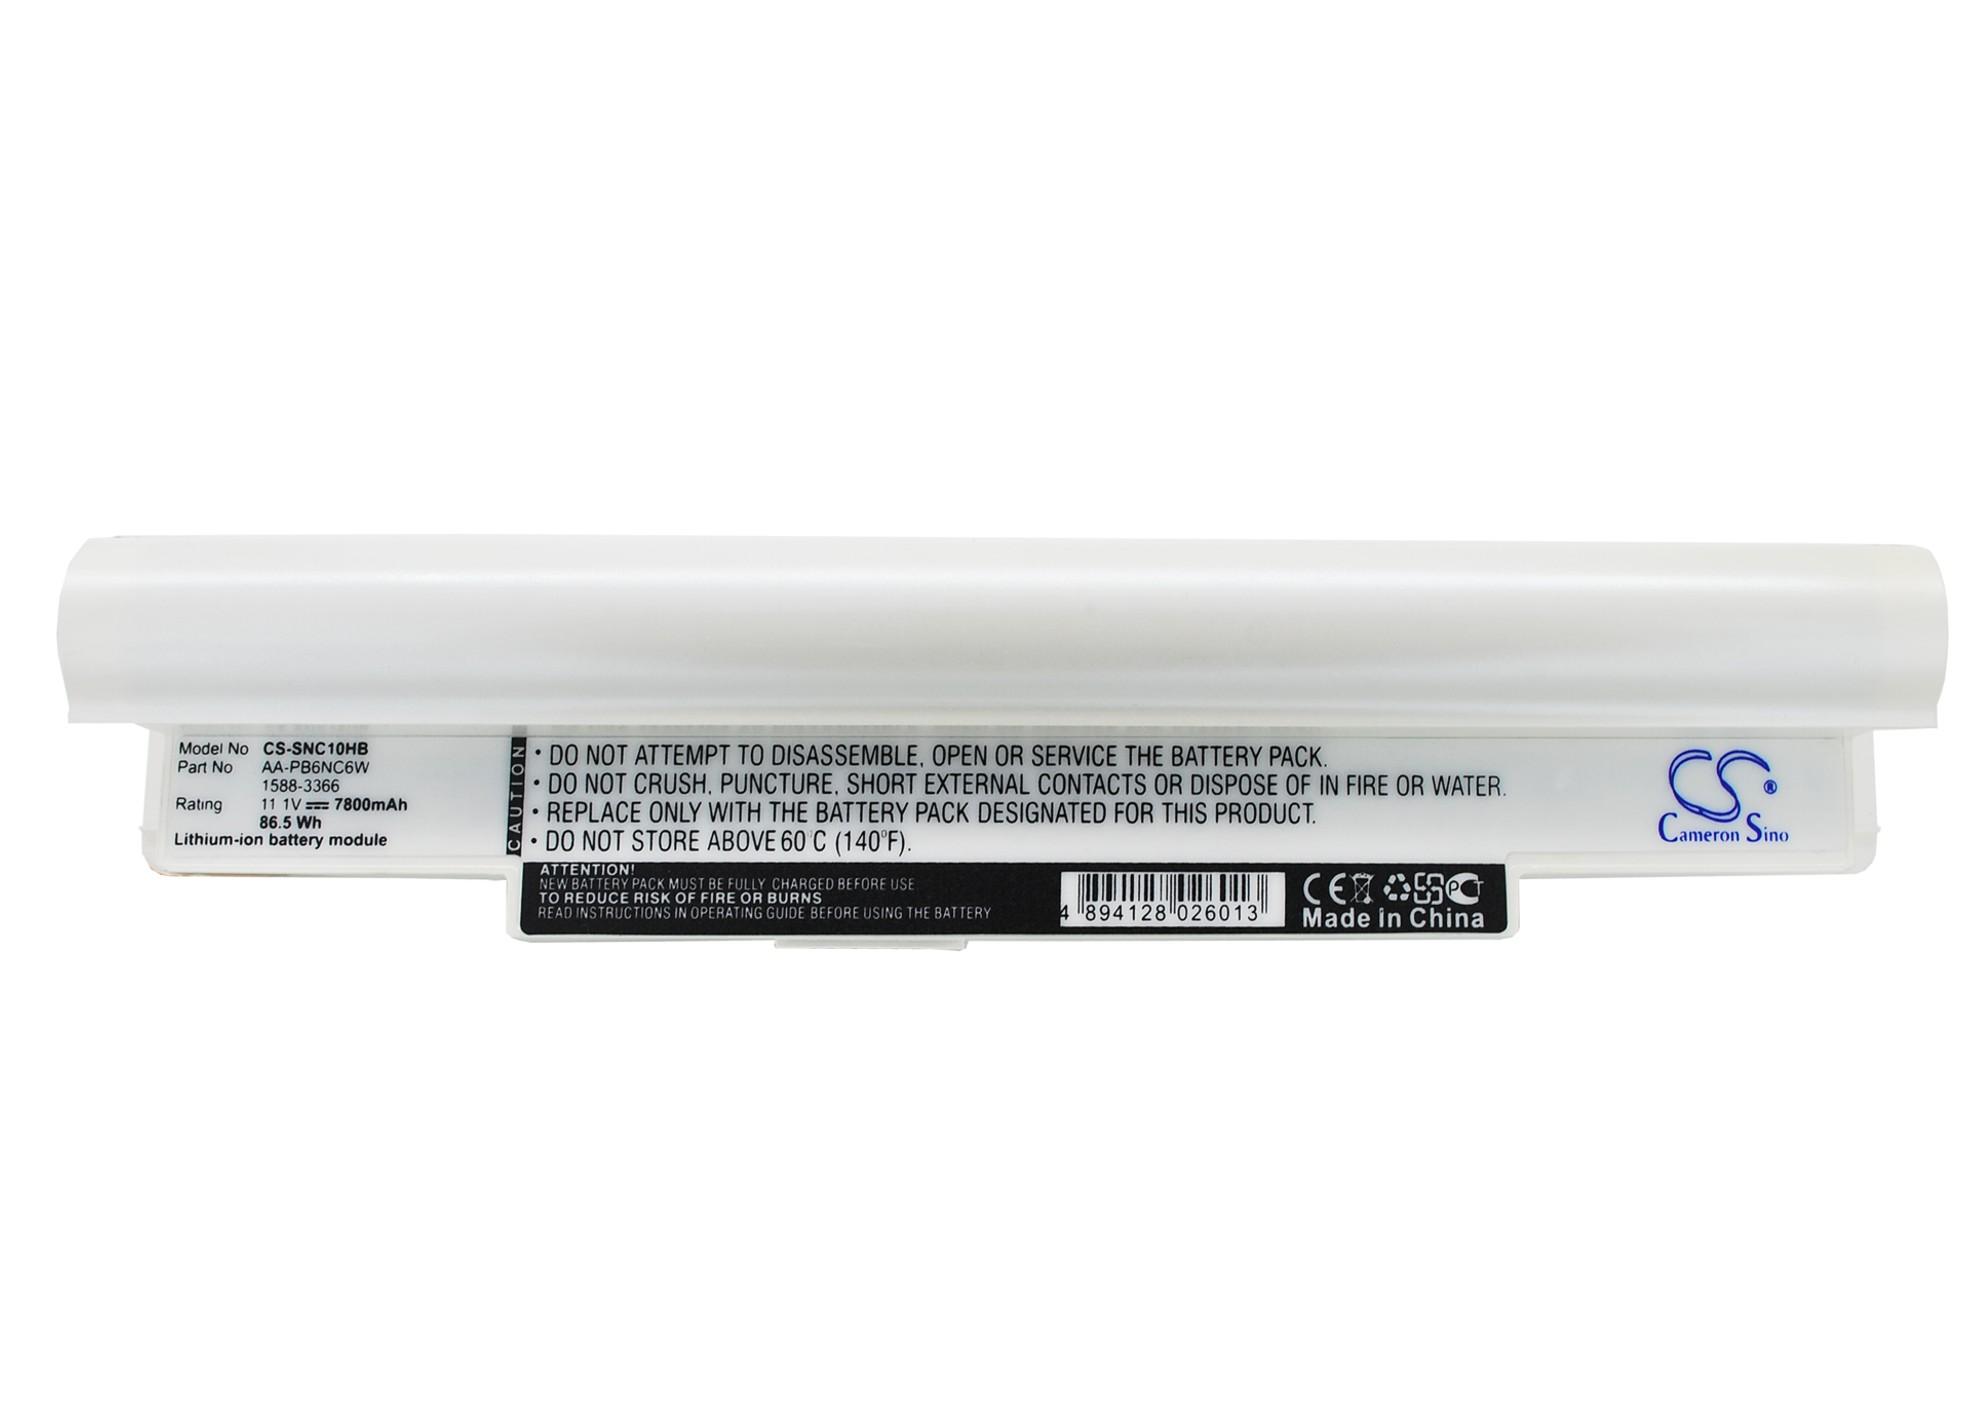 Cameron Sino baterie do notebooků pro SAMSUNG NP-NC10-KA01DE/SEG 11.1V Li-ion 7800mAh bílá - neoriginální